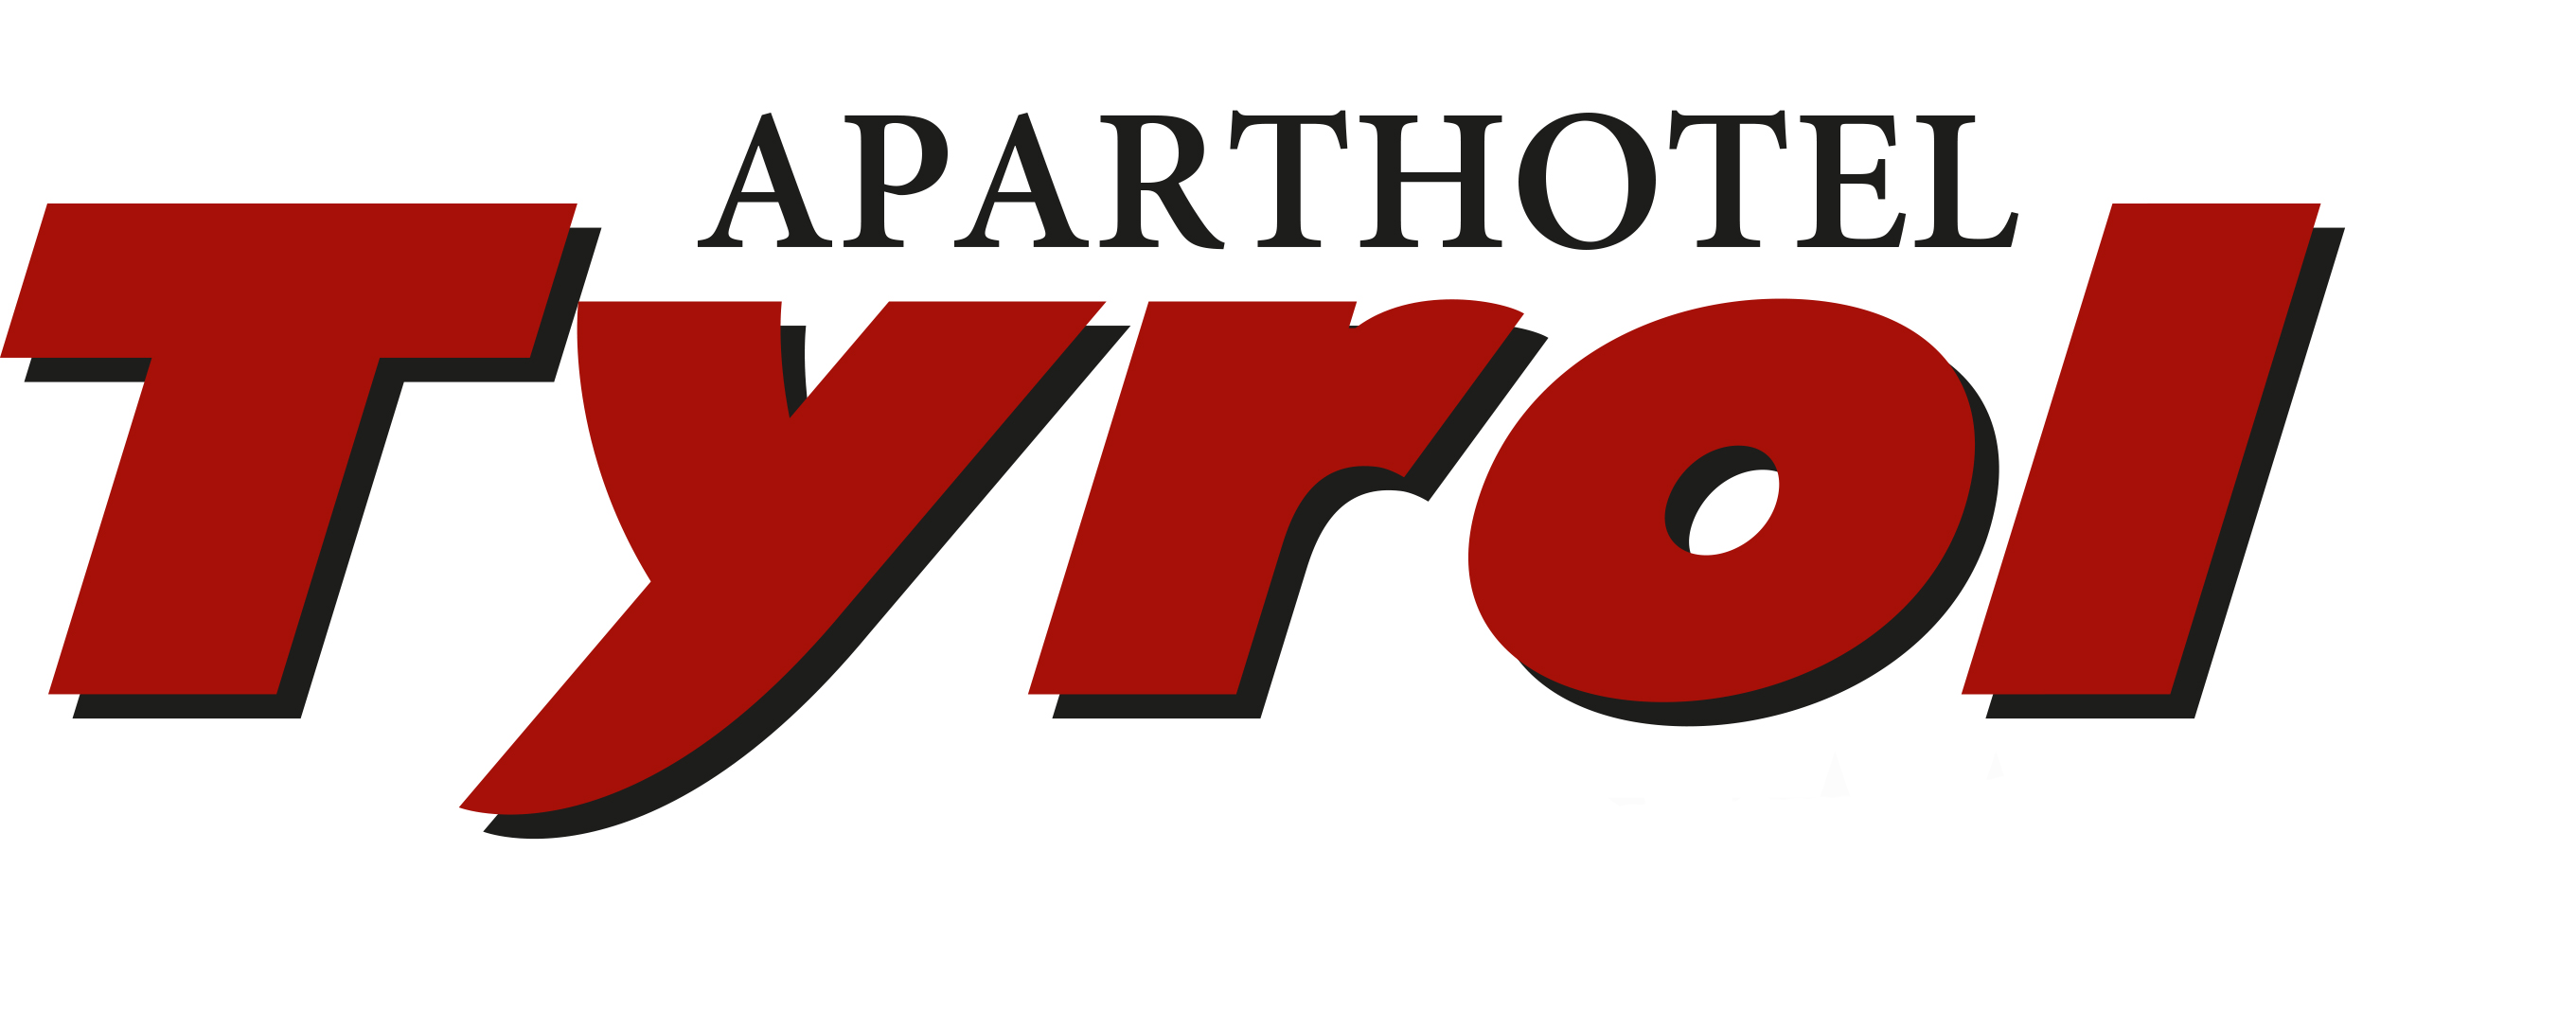 Aparthotel Tyrol Lermoos Zugspitzarena